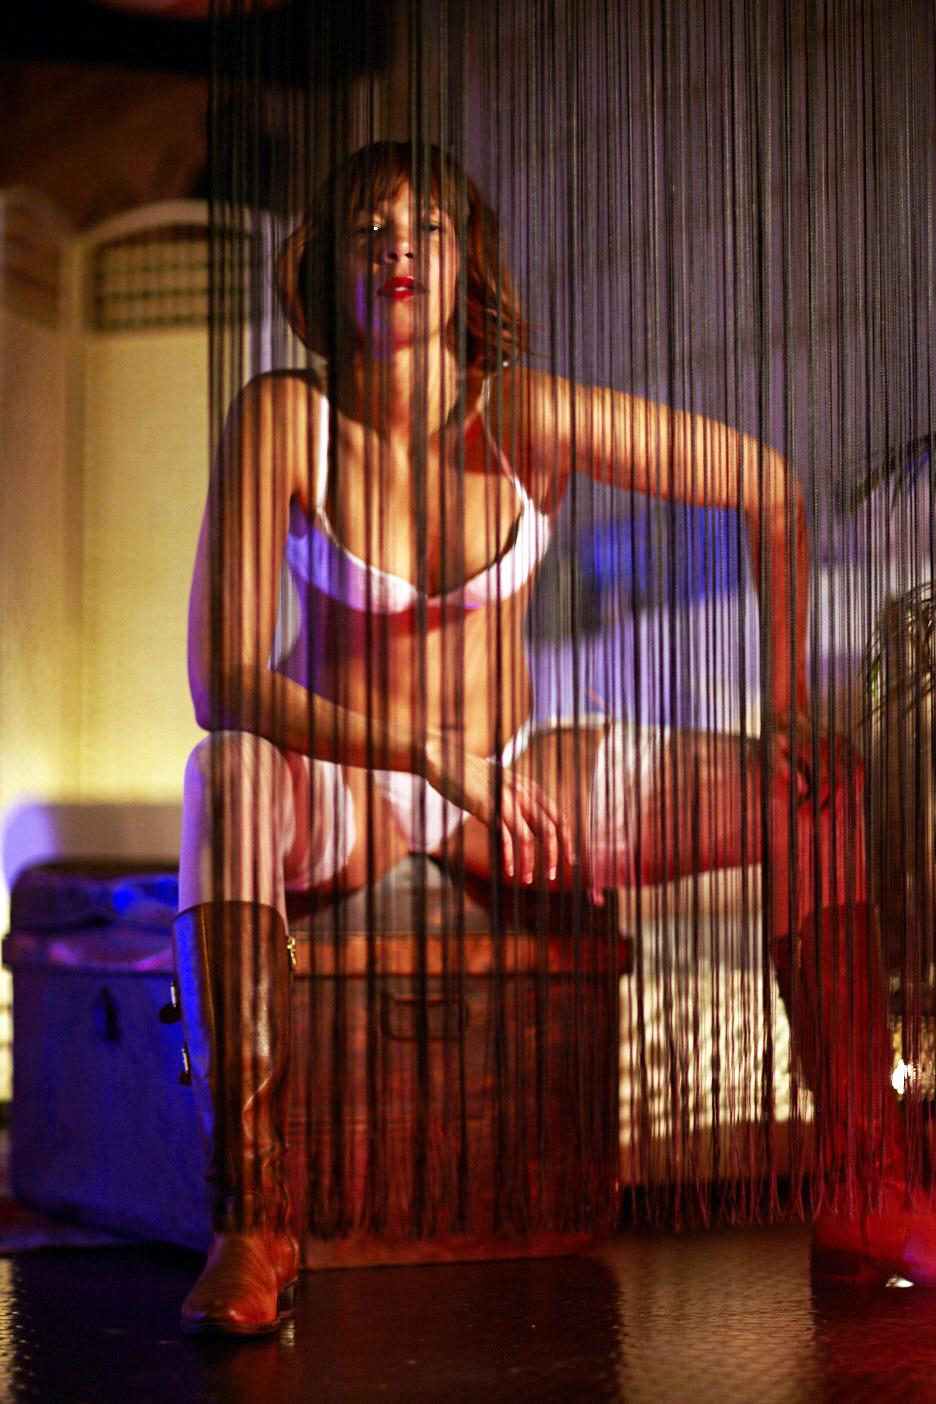 Powerful-bondage-mistress-male-captive-play-orgasm-control-edging-tease-denial-dominatrix-in-london.jpg